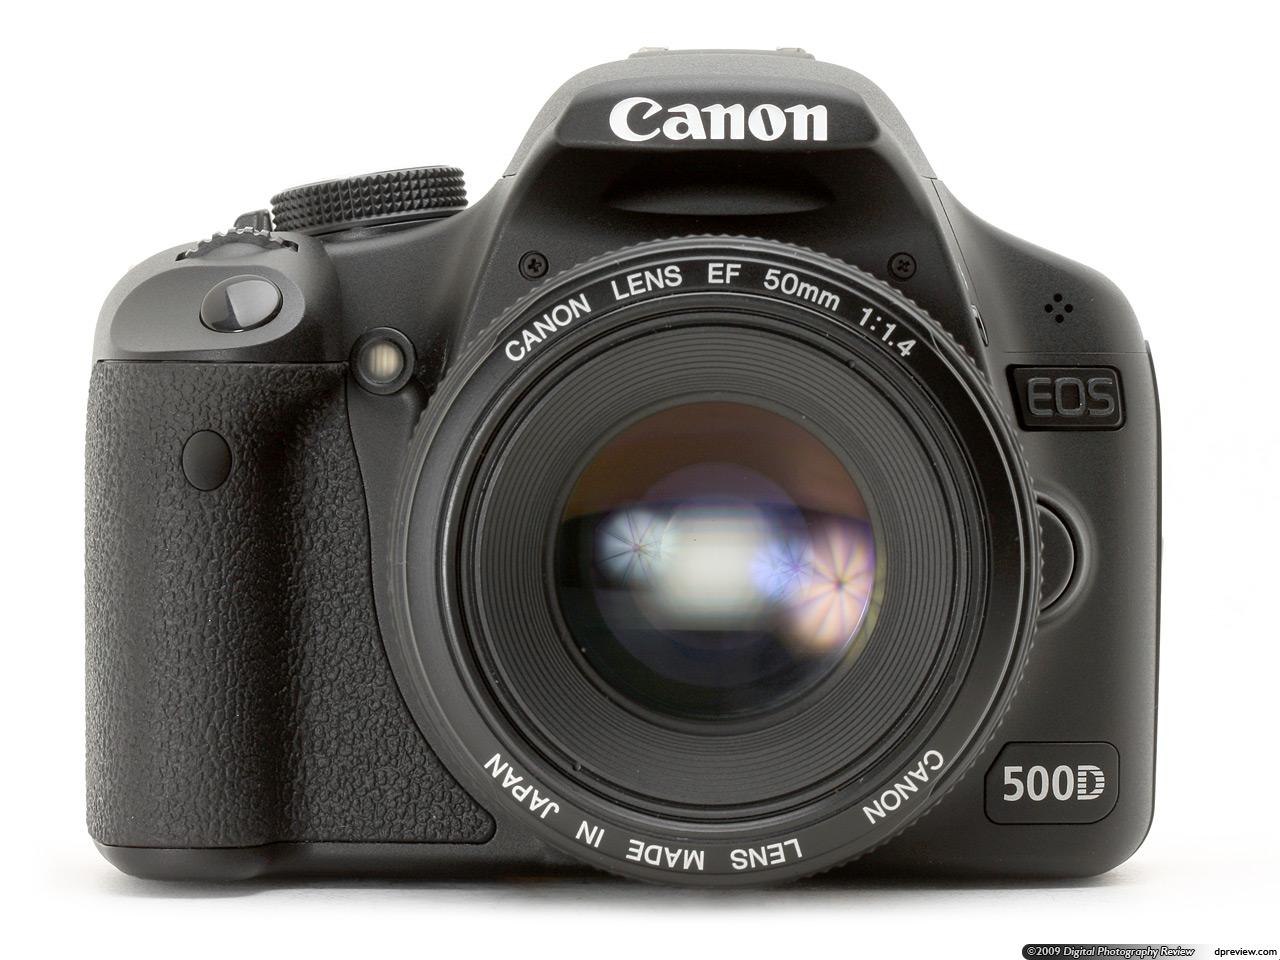 Canon Eos 500 Инструкция - engcenter